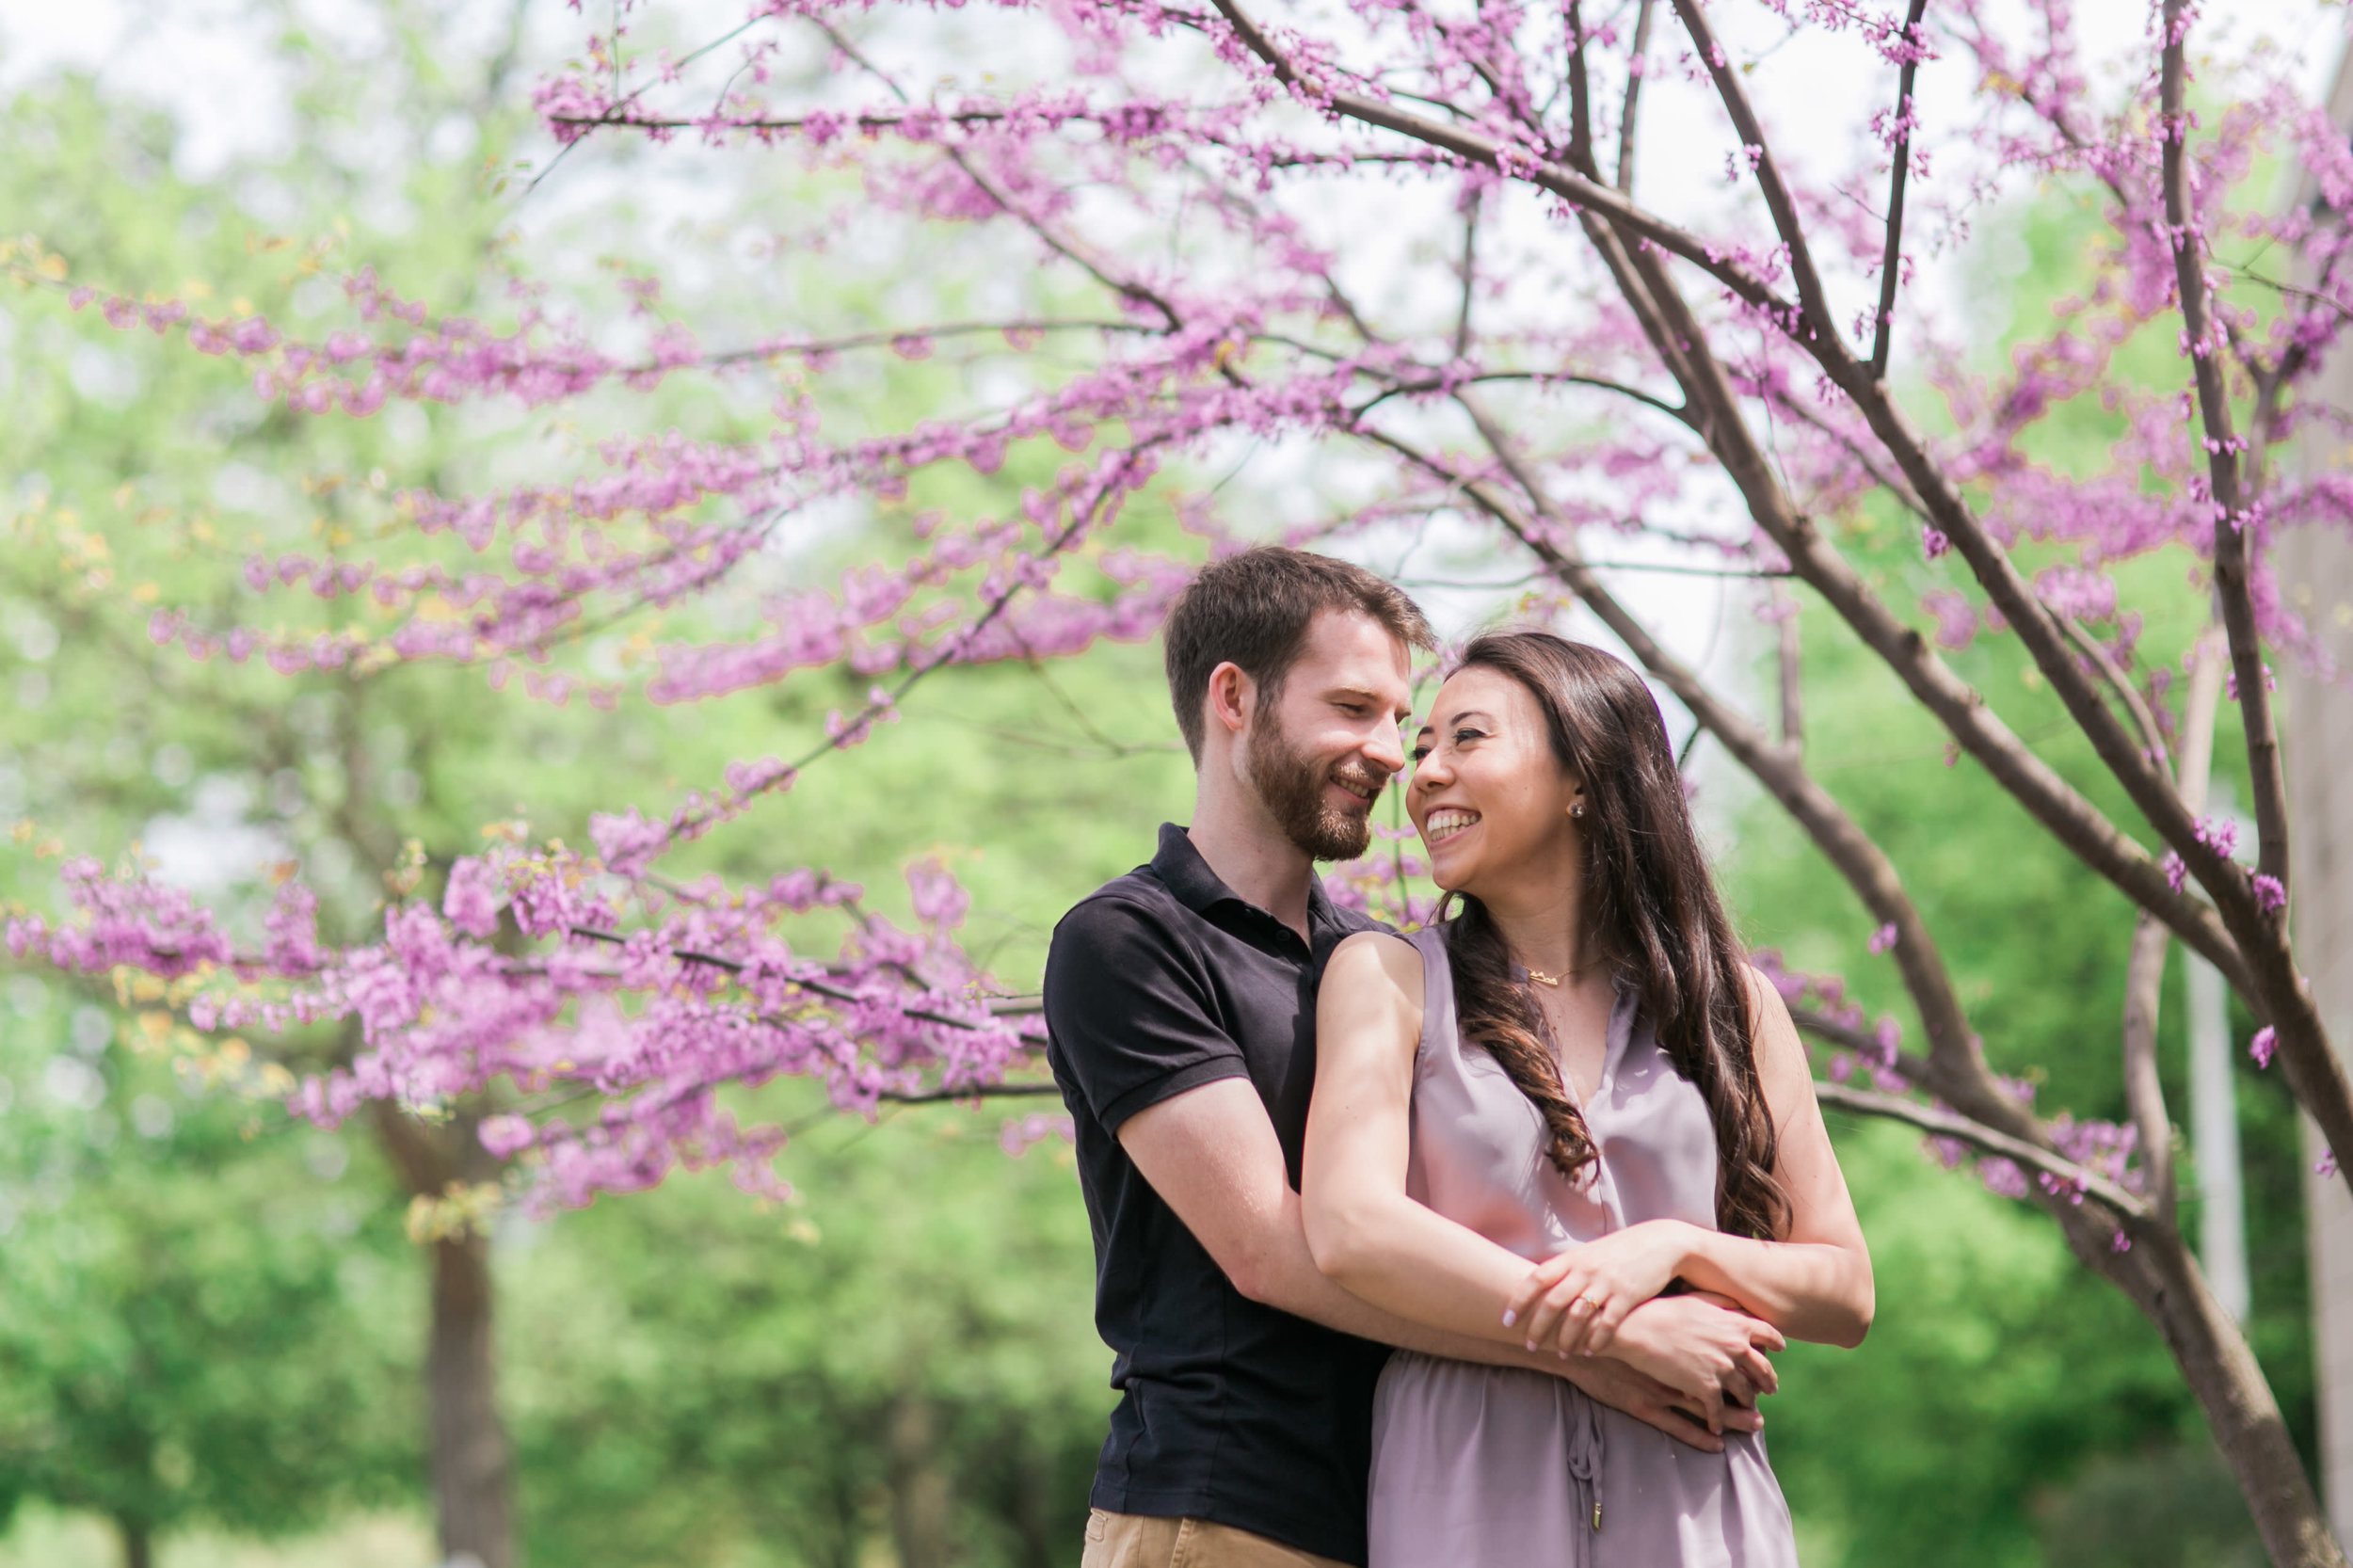 Amanda___Matthew_Engagement_Photos___Daniel_Ricci_Weddings_32.jpg